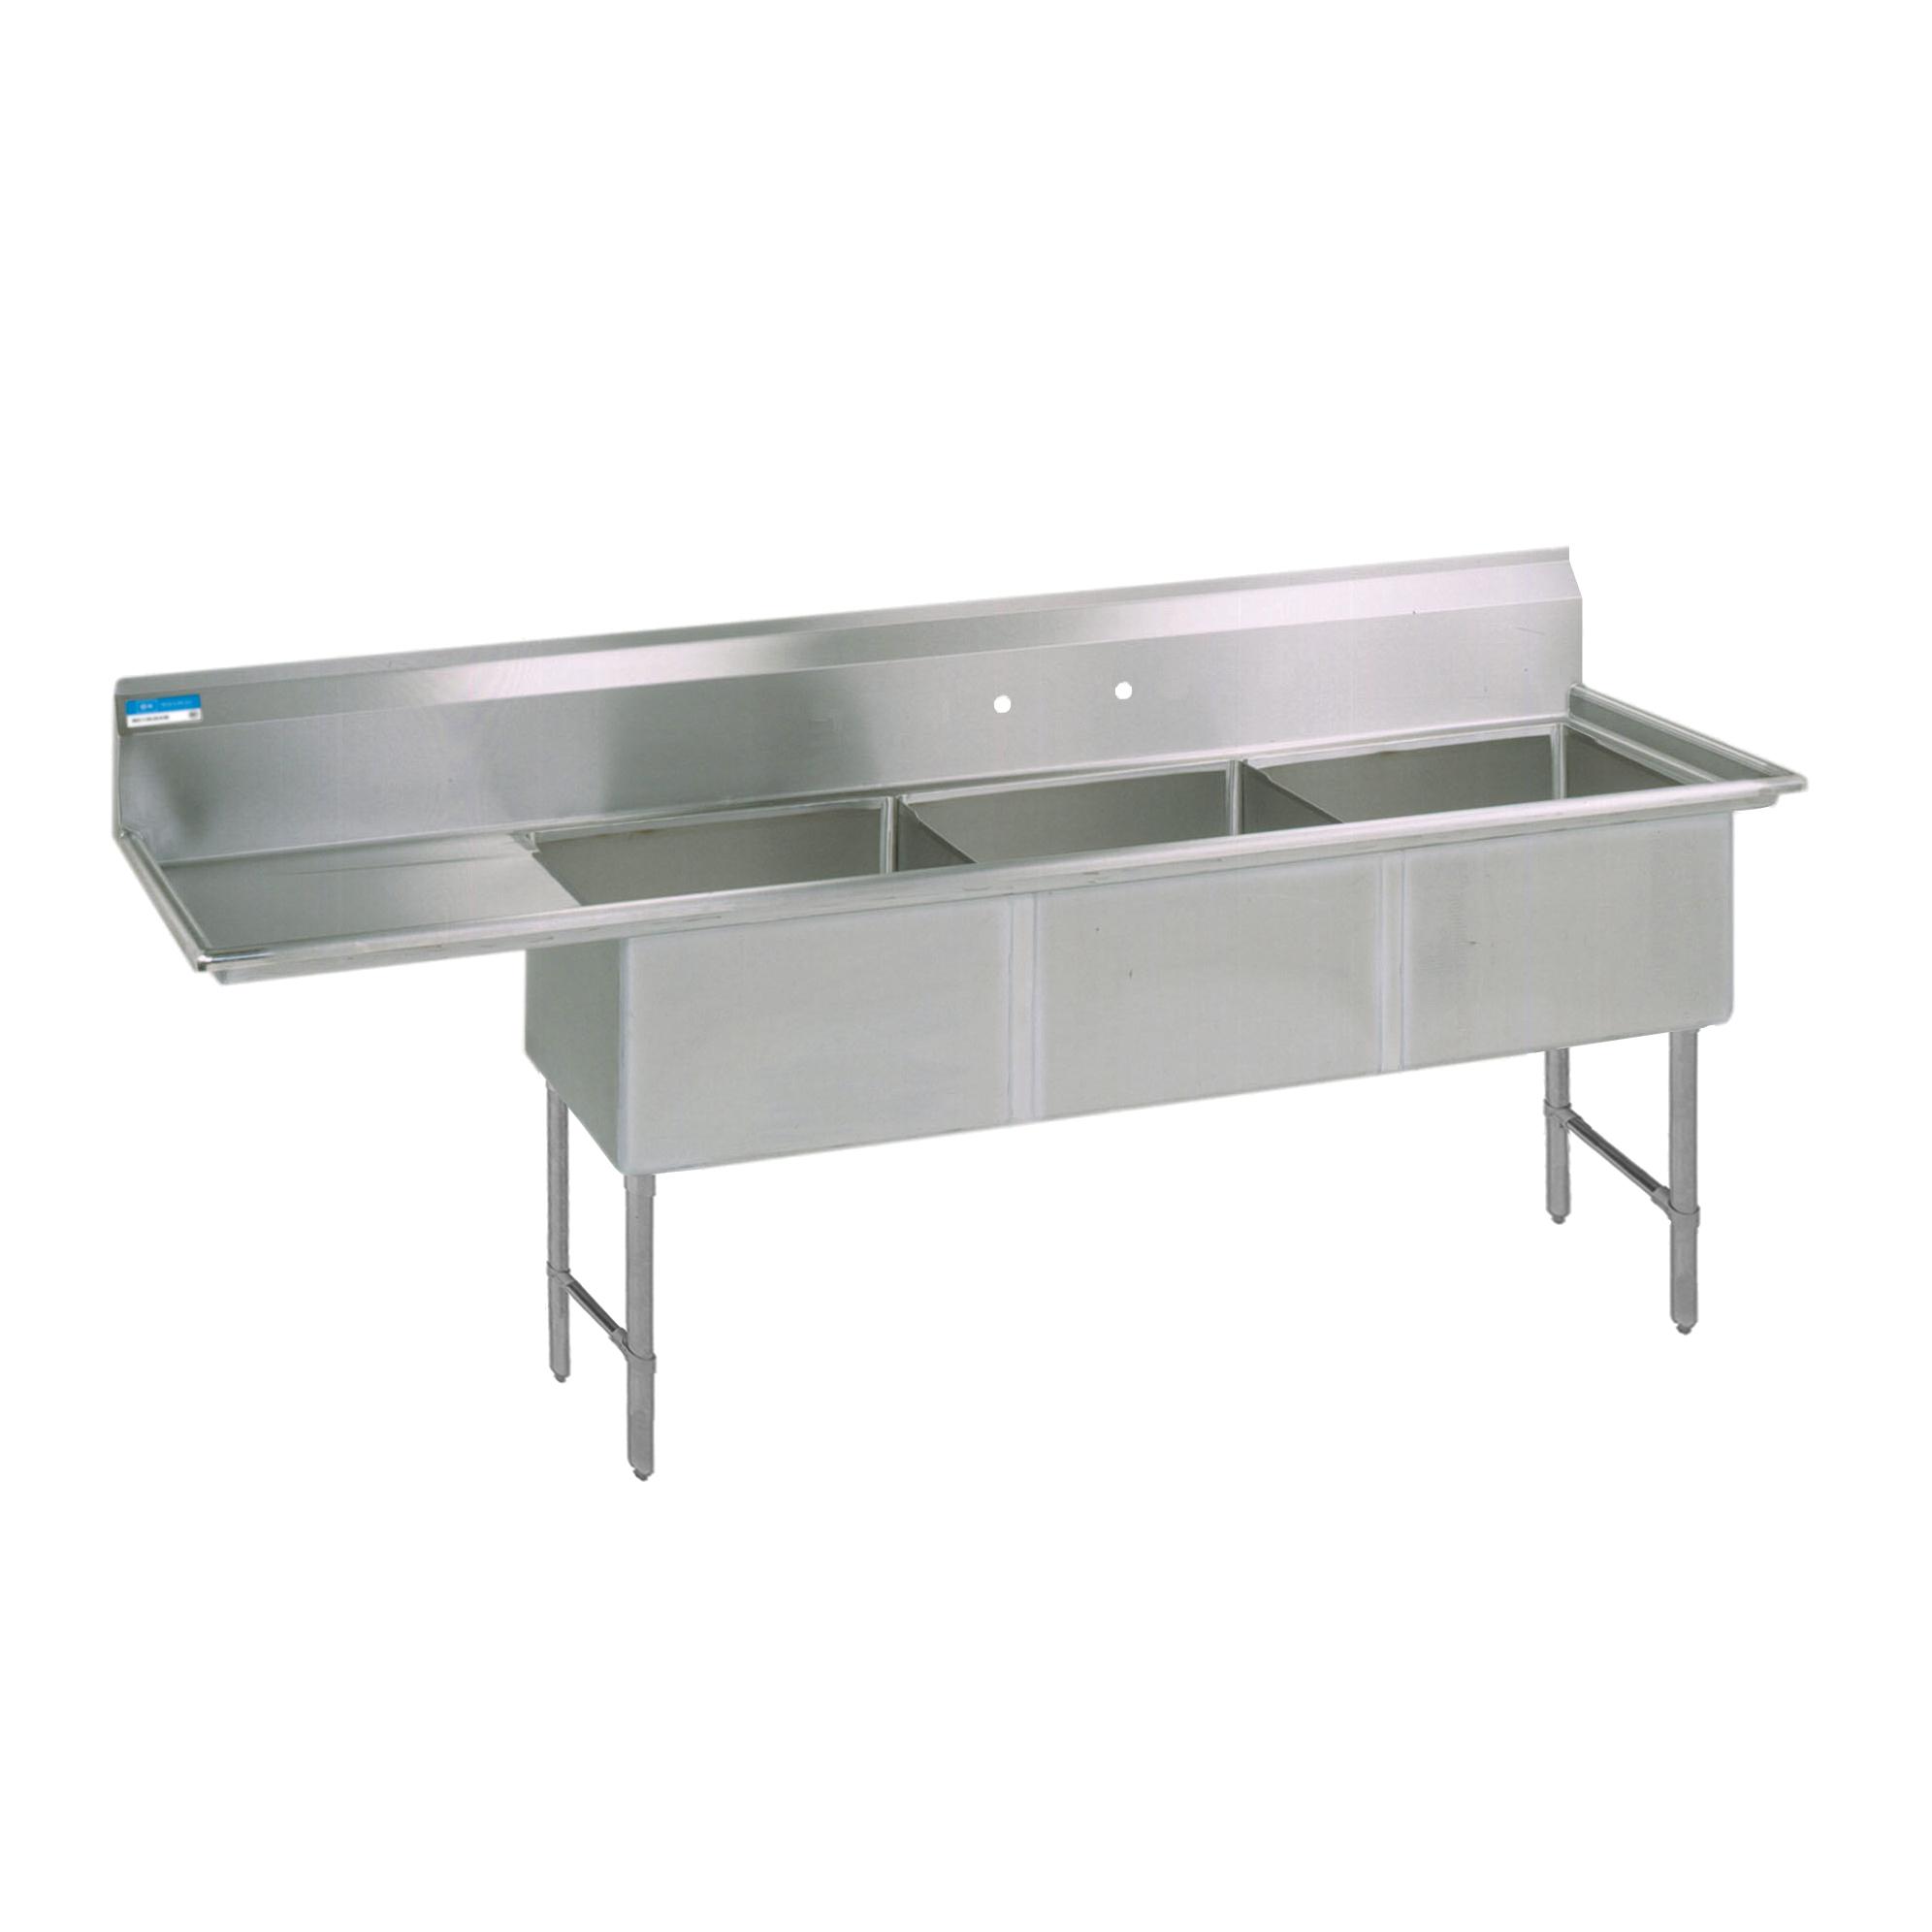 BK Resources BKS6-3-18-14-18LS sink, (3) three compartment